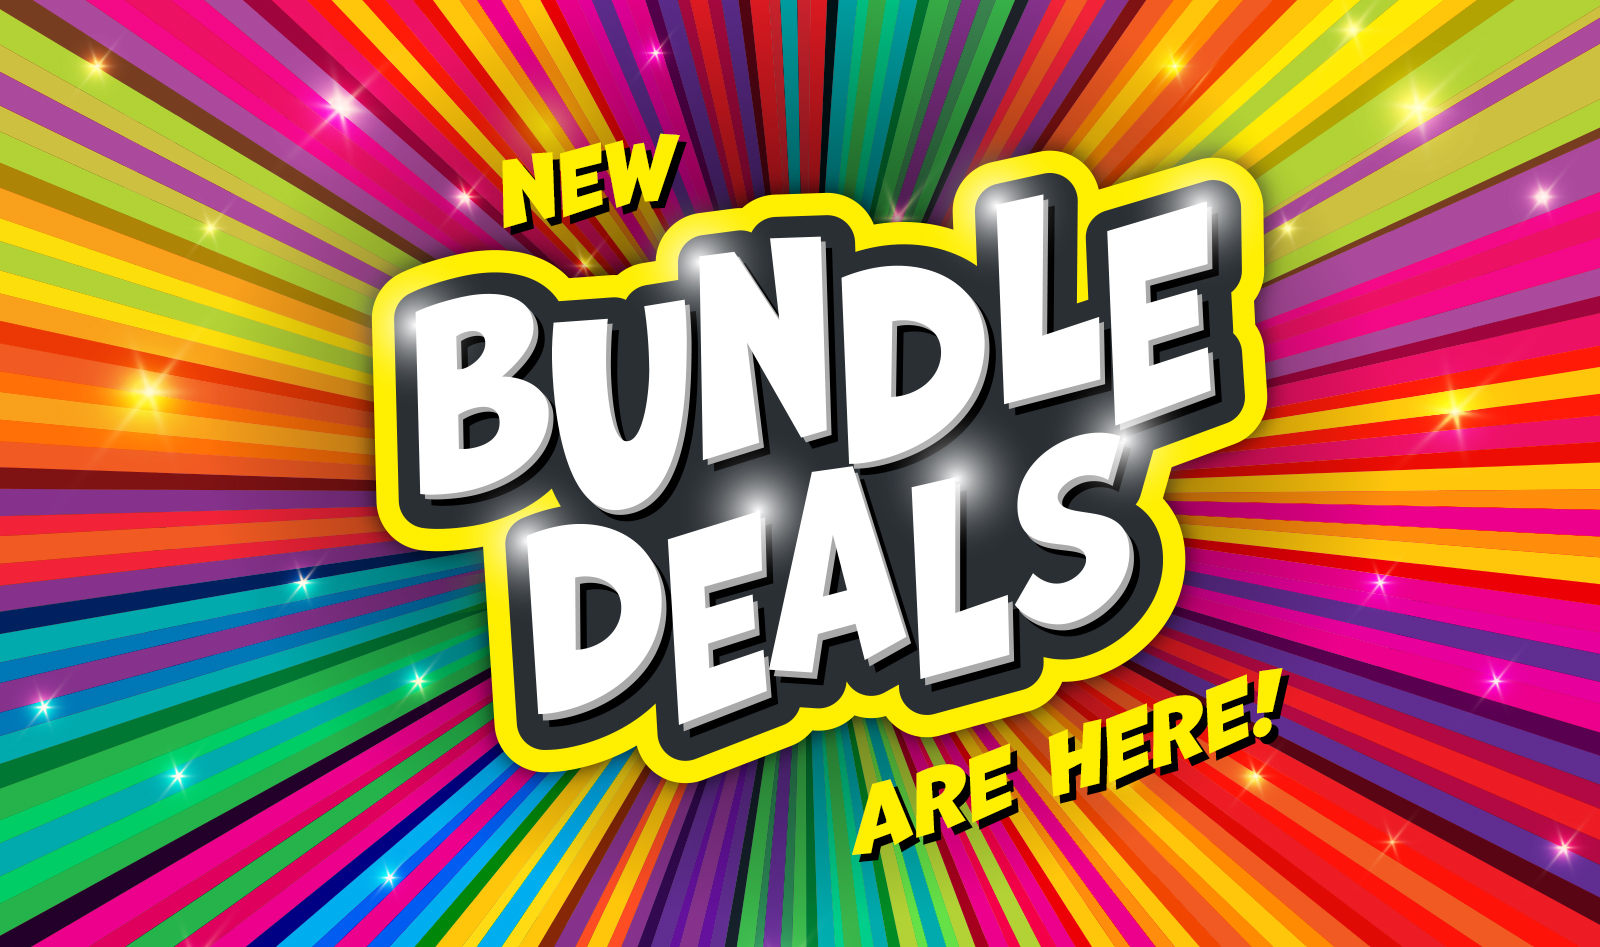 new-bundle-deals-banner.jpg